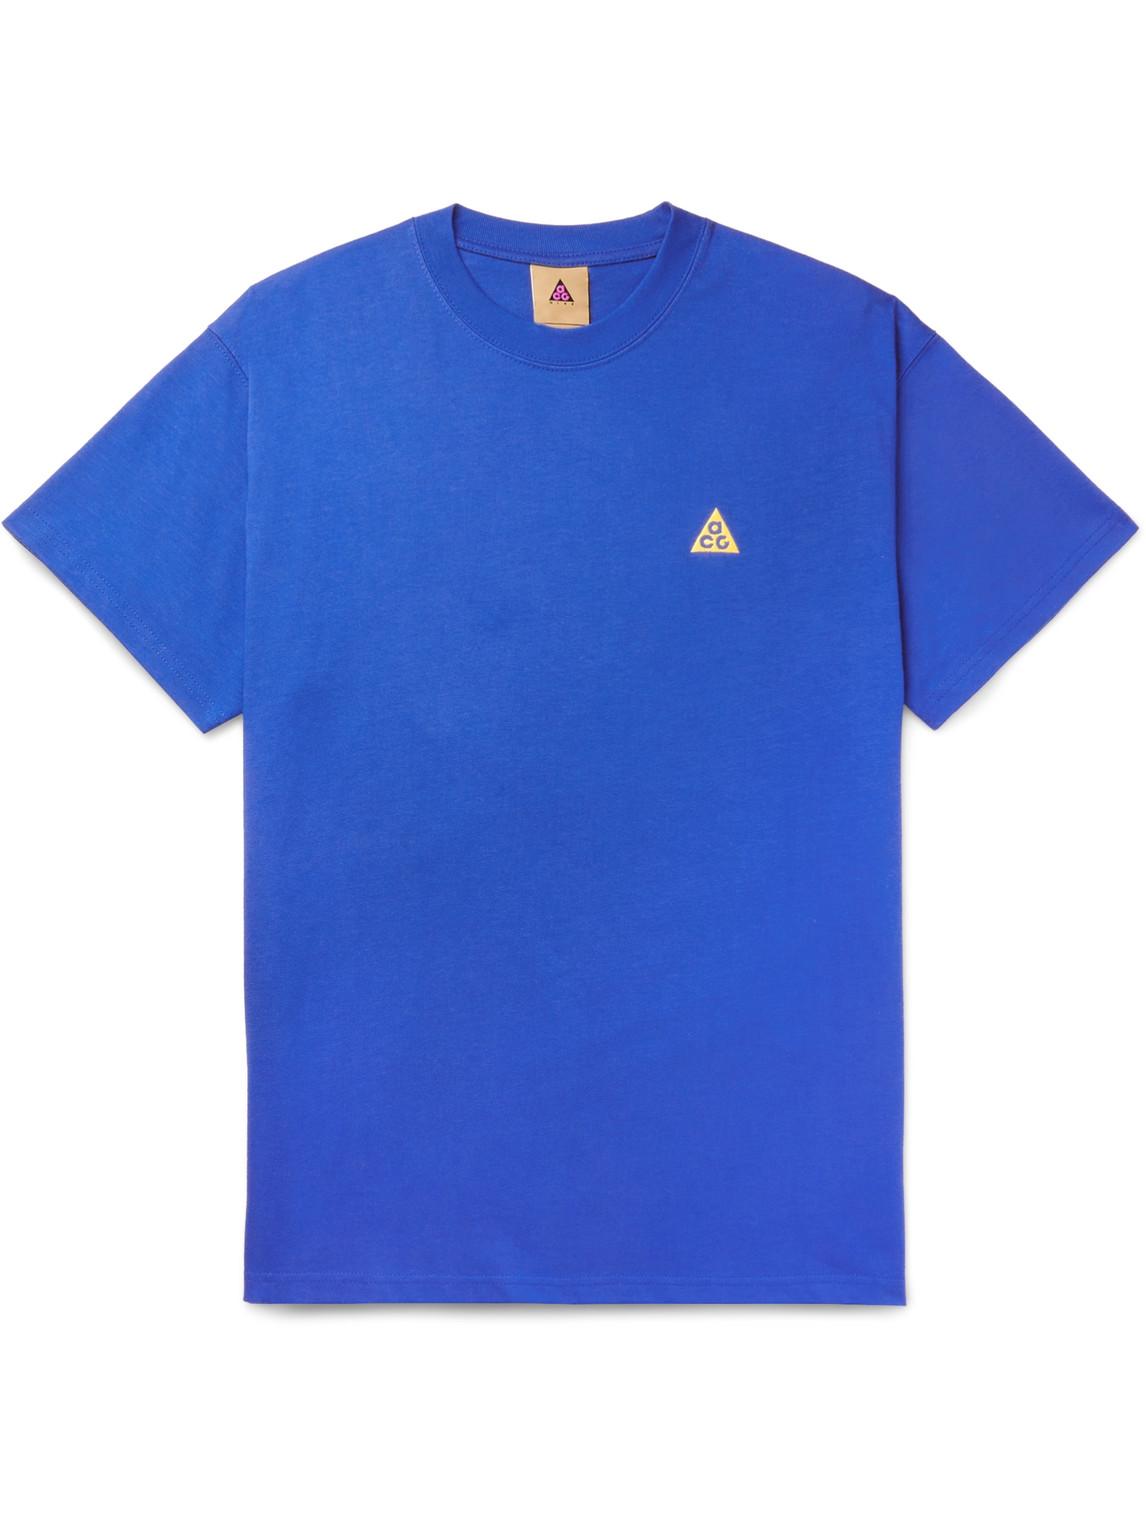 Nike - Acg Nrg Logo-Embroidered Cotton-Jersey T-Shirt - Men - Blue - M